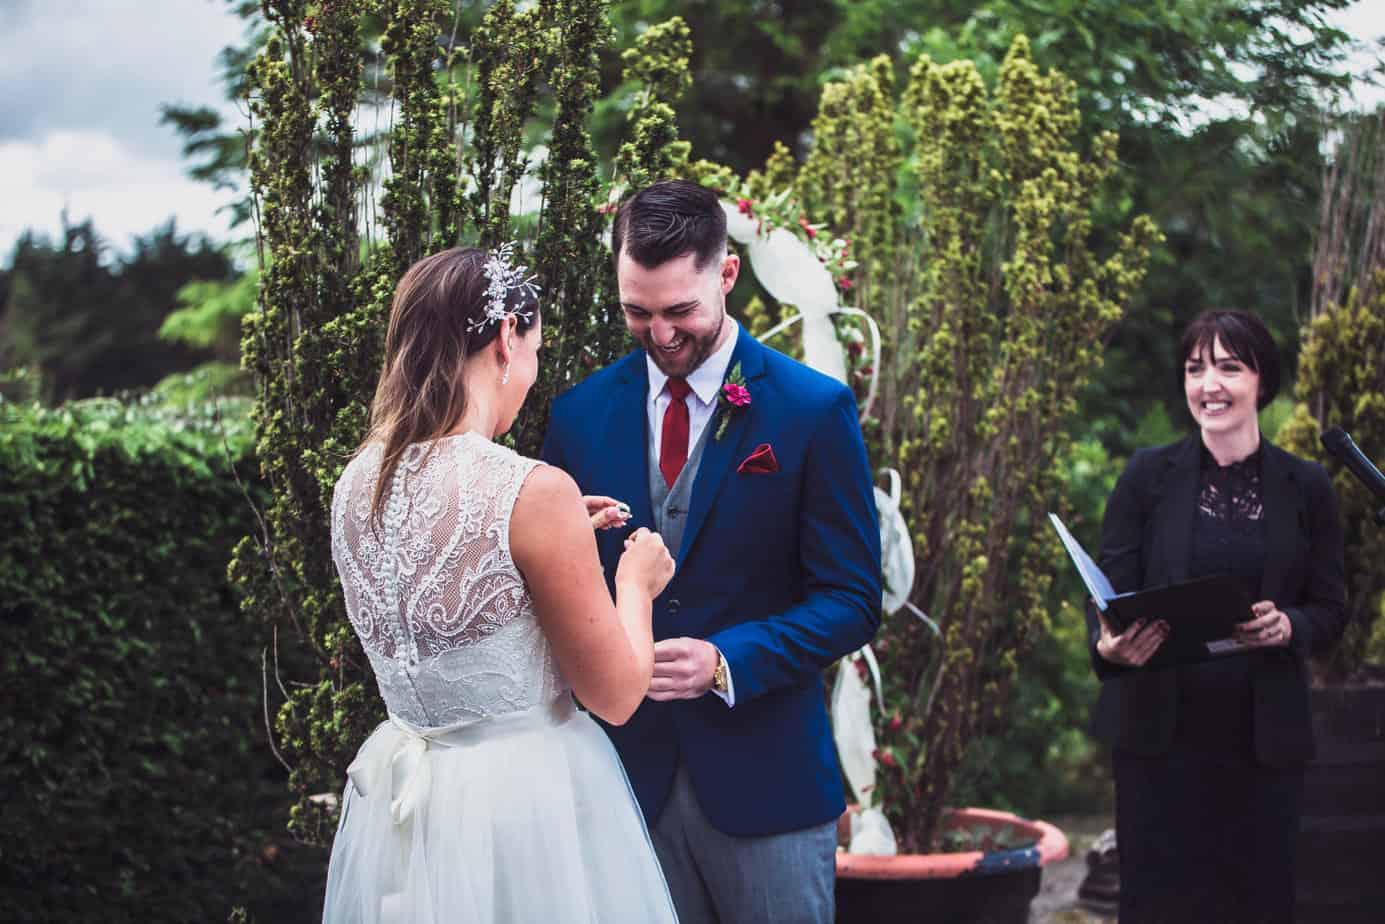 Ethical wedding celebrant Yvonne Cassidy